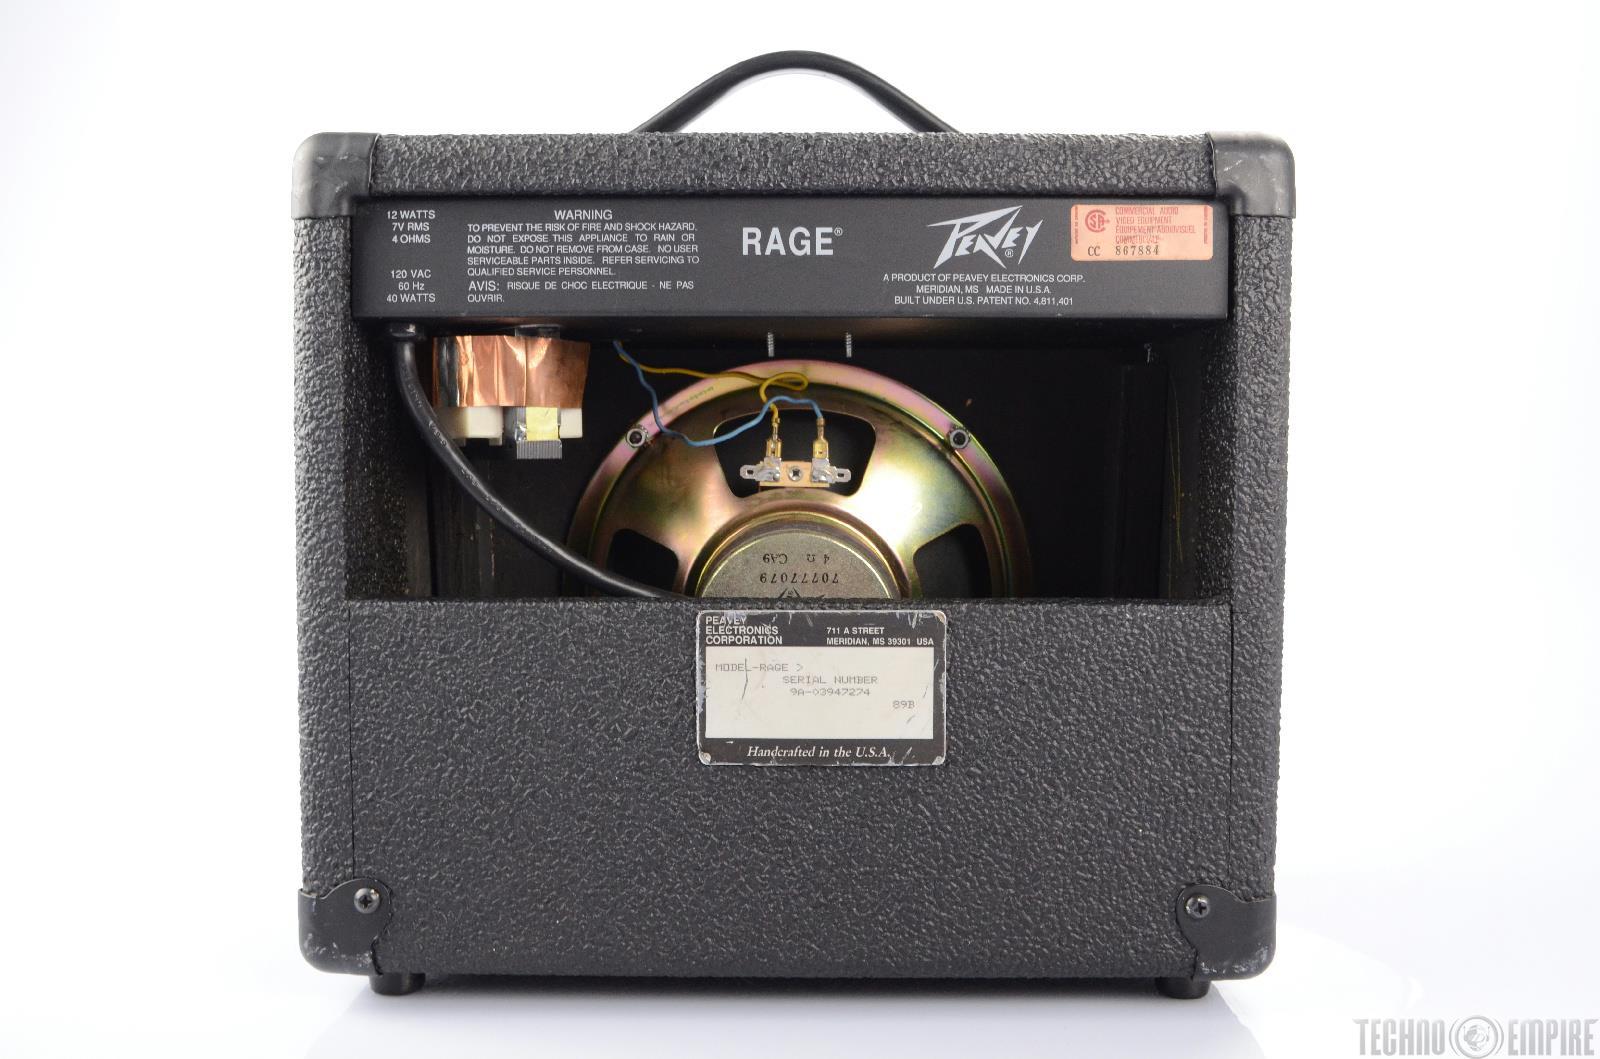 peavey rage 12 watt 12w combo guitar portable beginner amp amplifier 21871 ebay. Black Bedroom Furniture Sets. Home Design Ideas